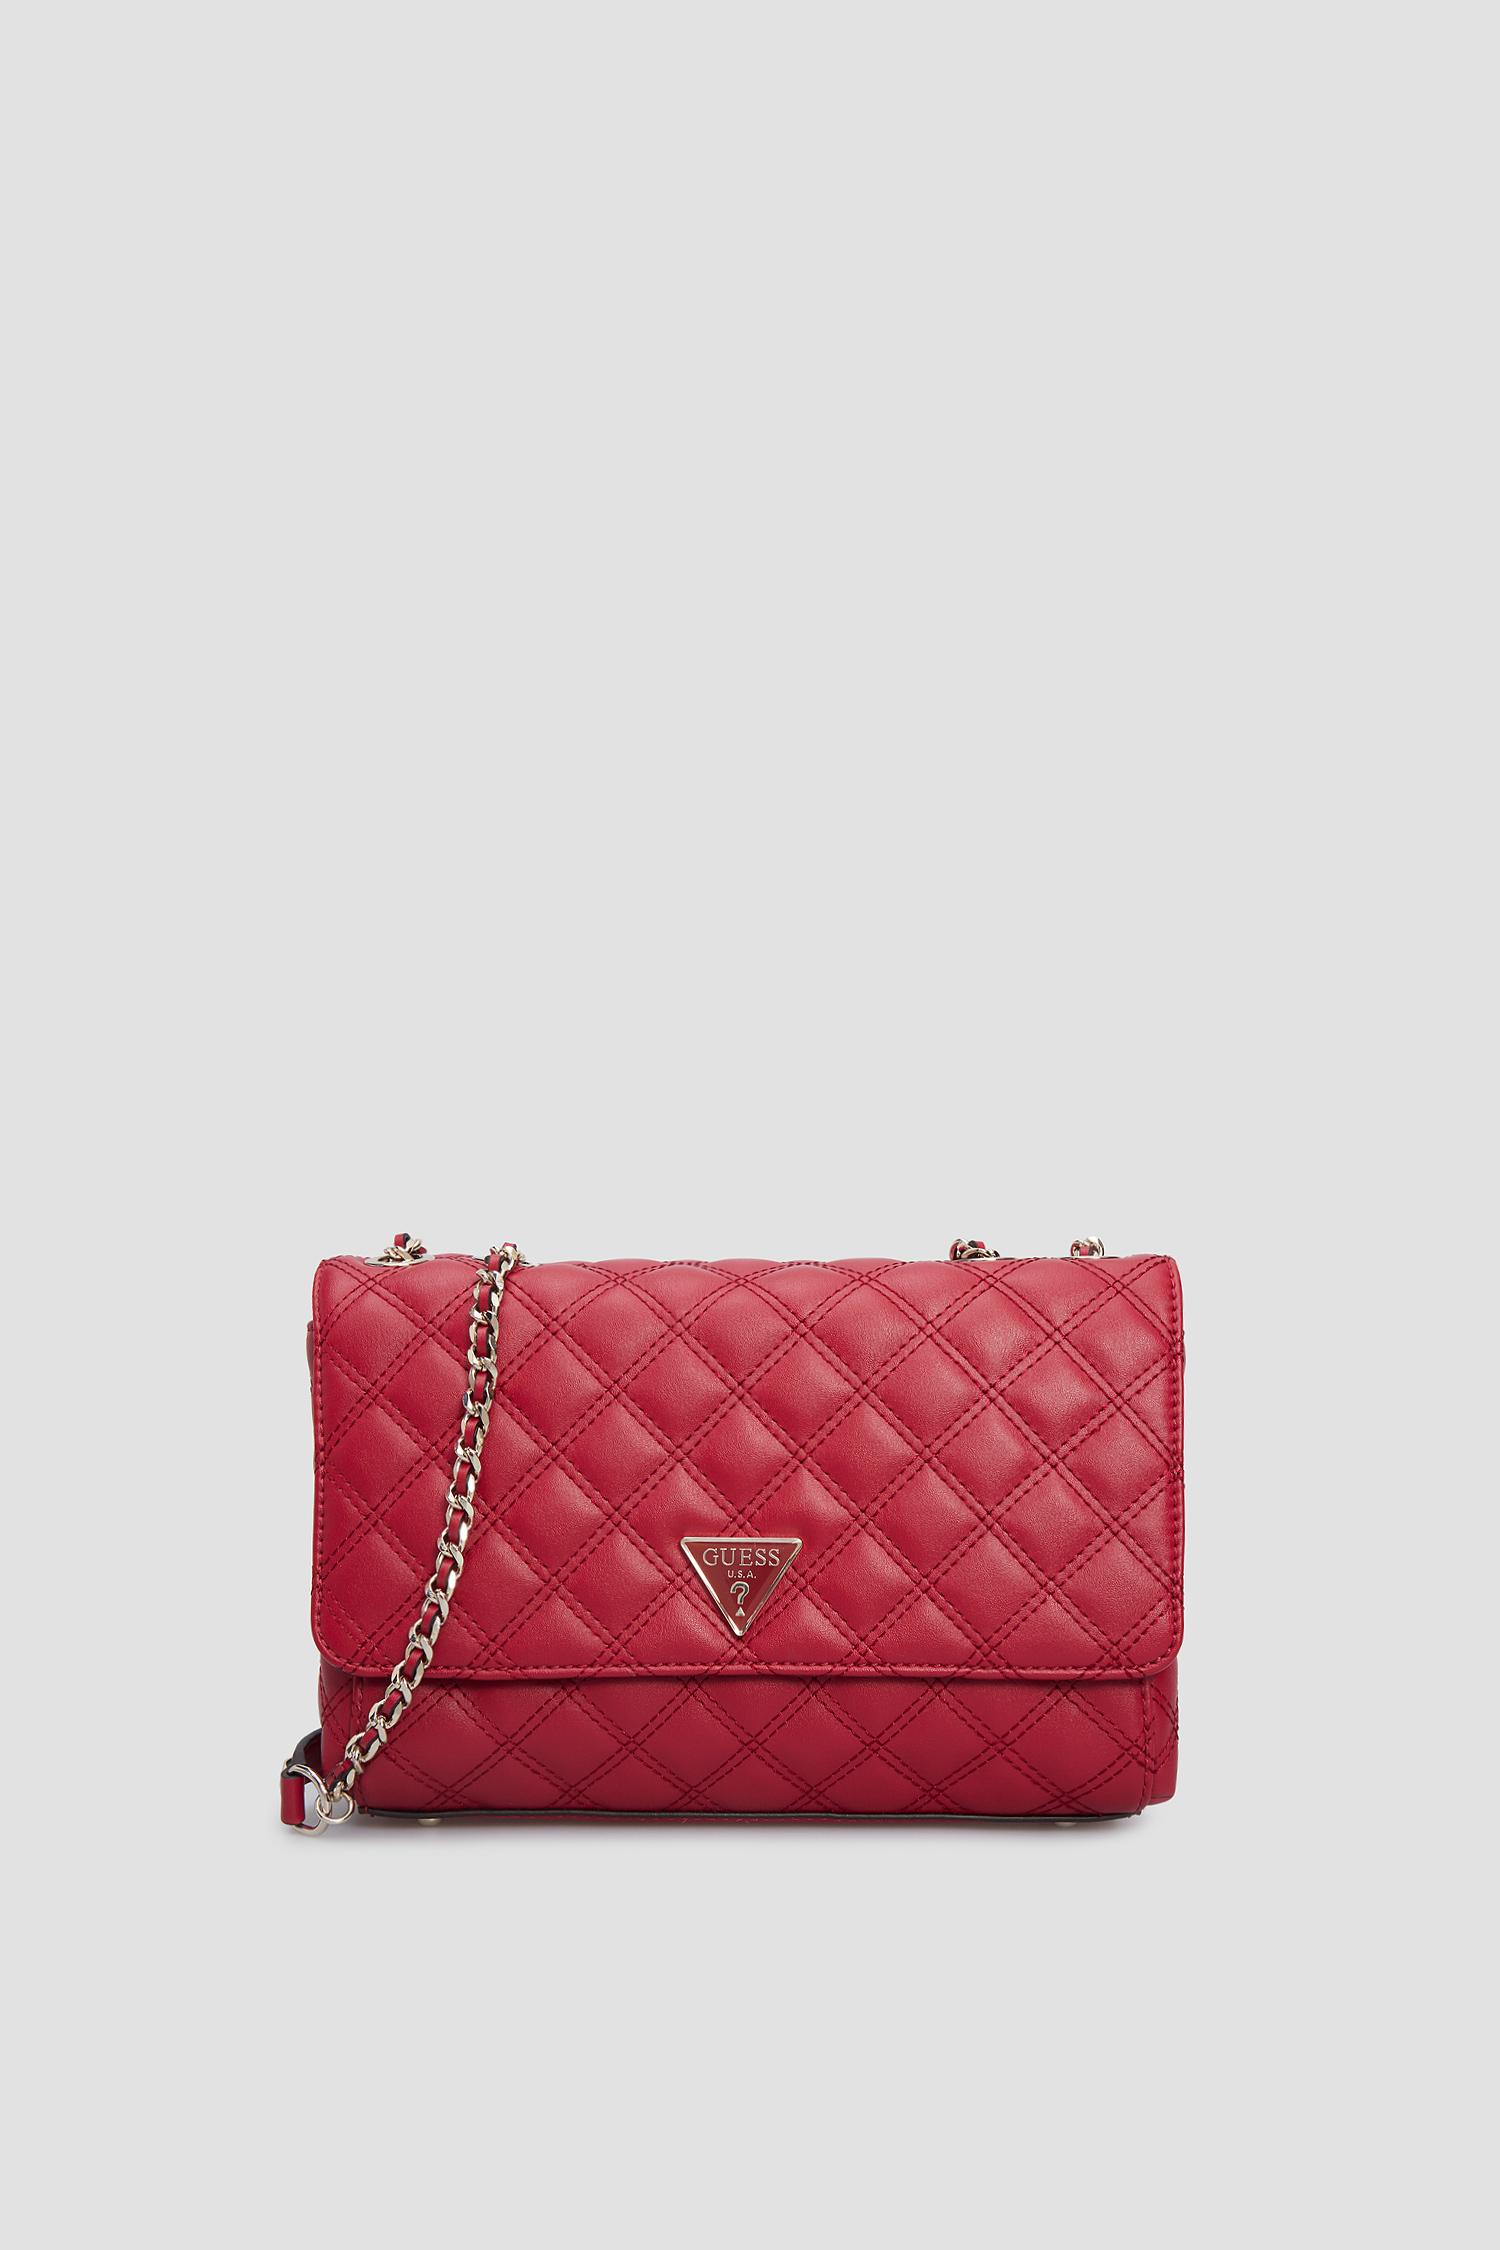 Женская красная сумка через плечо Guess HWEV76.79210;RED